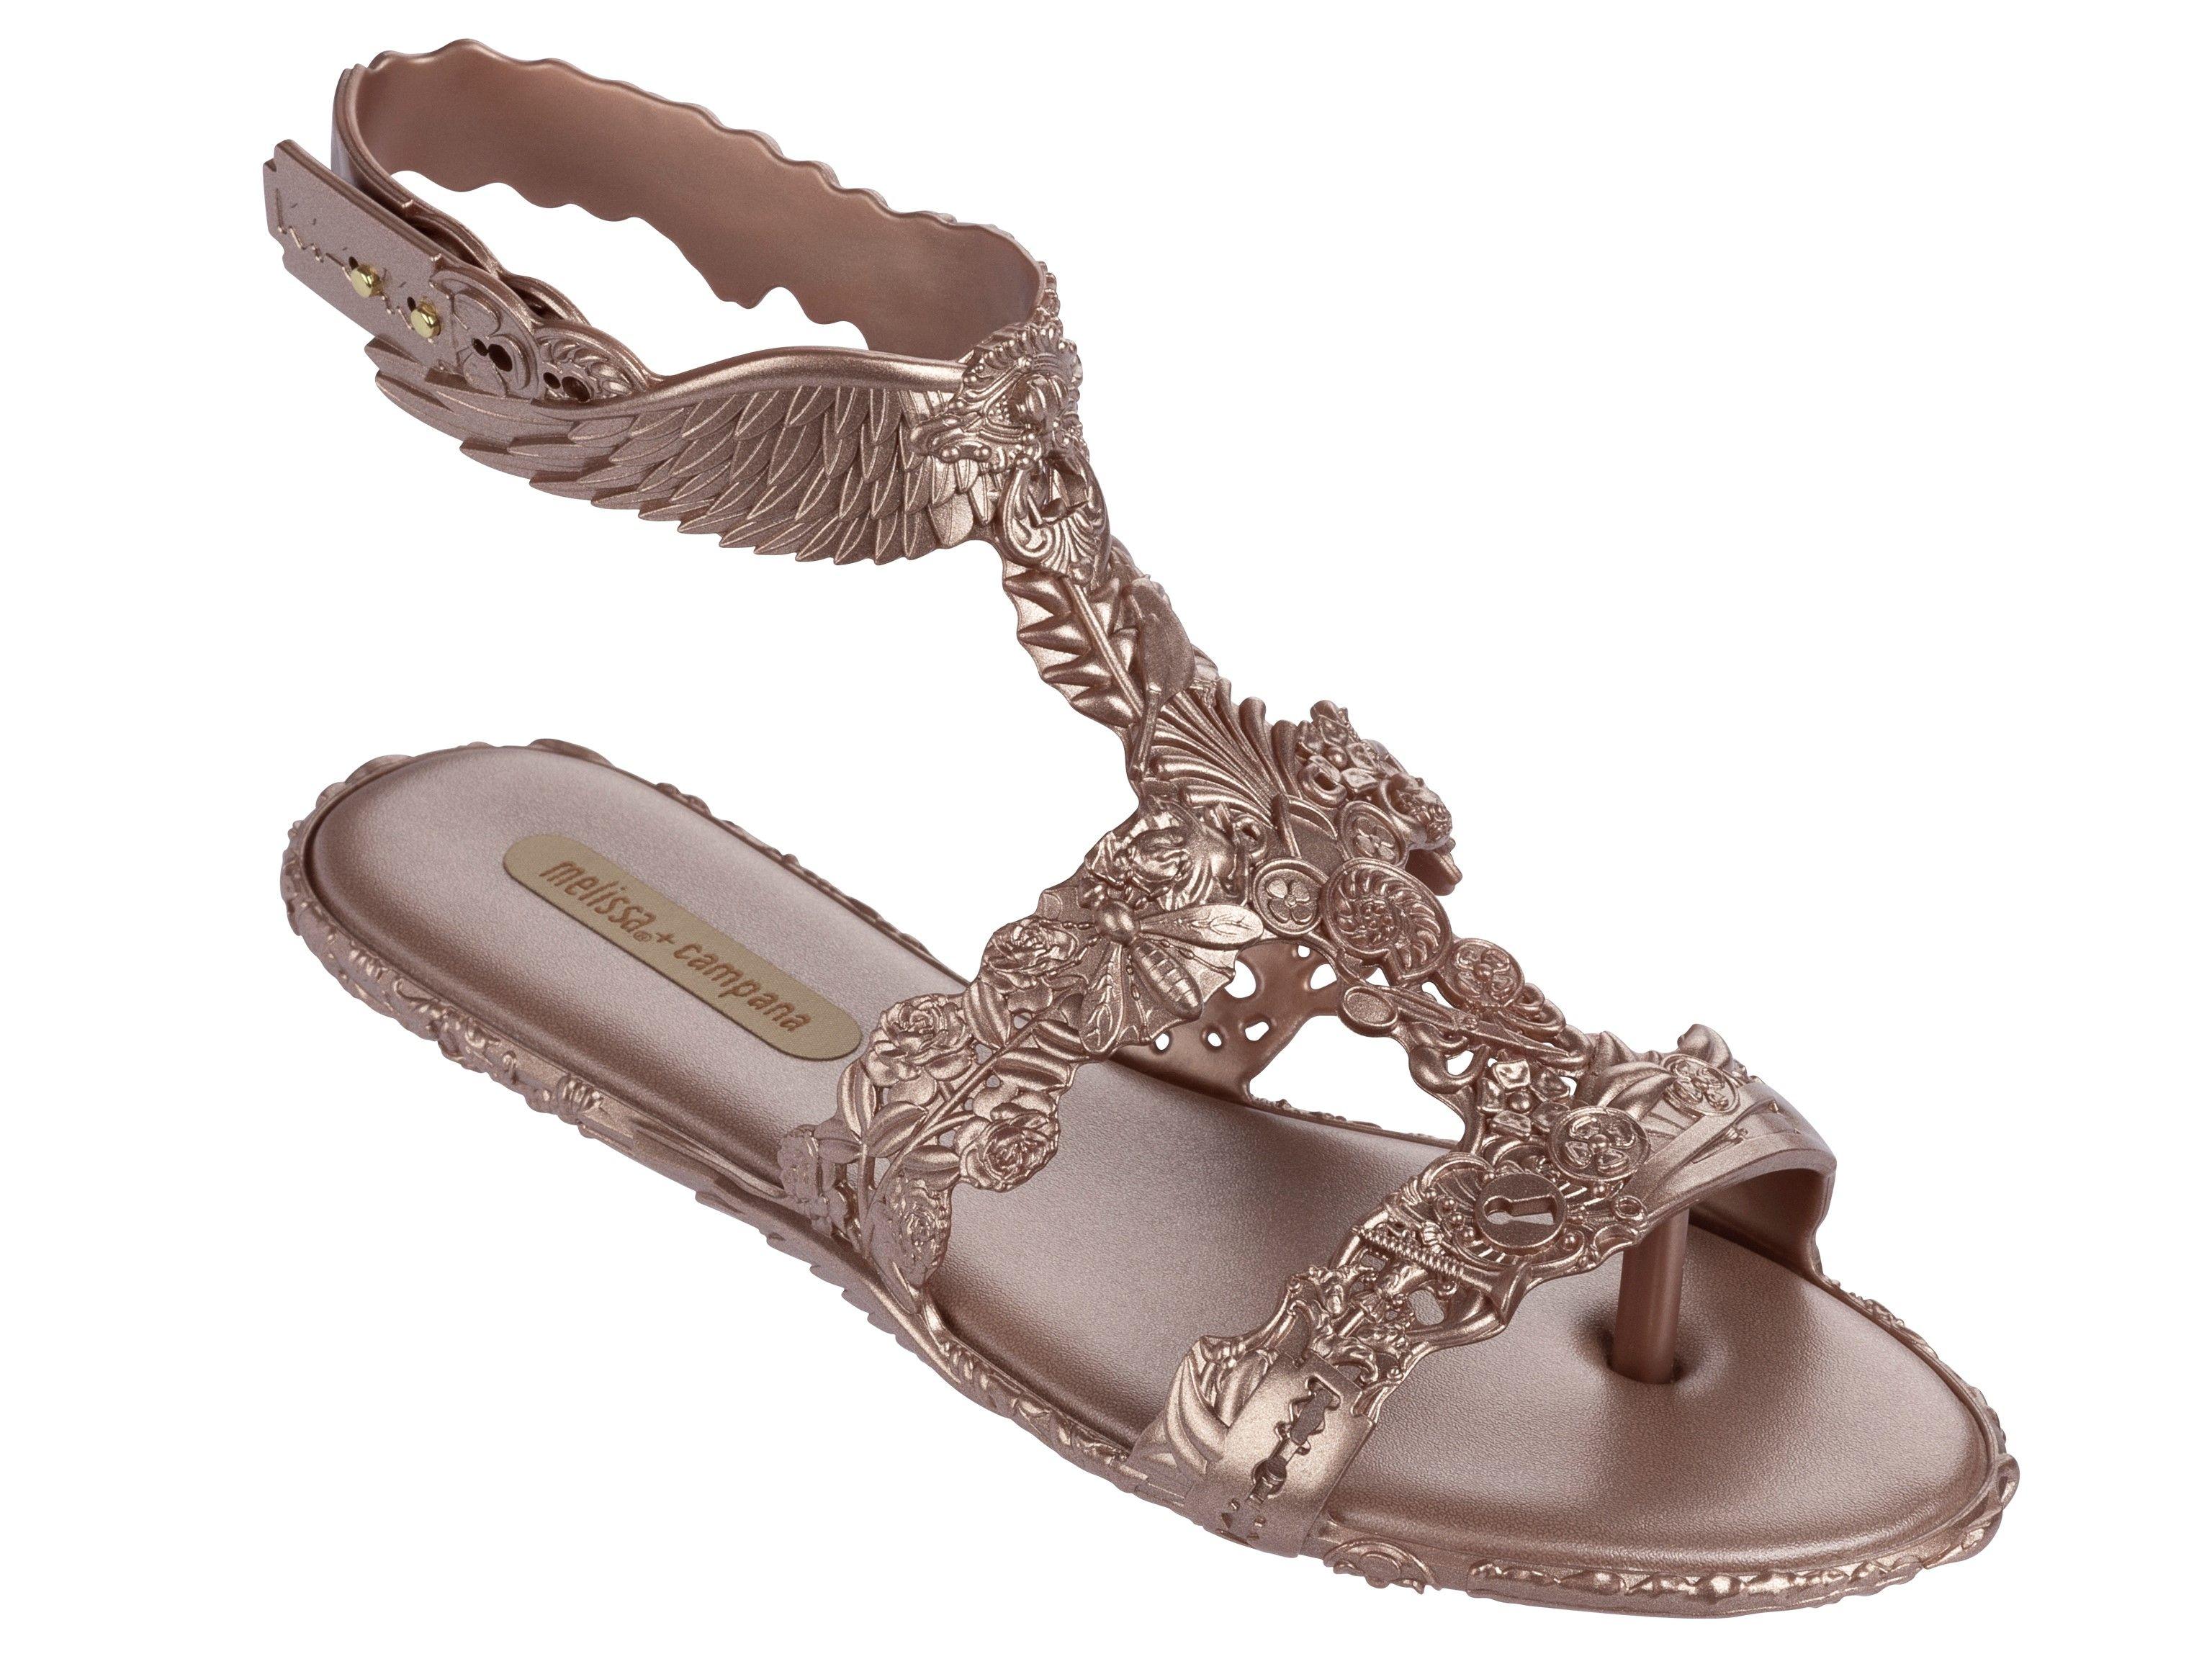 1a34ba507125 Melissa ružové sandále Campana Barroca Sandal Pink Metal - Dámske Topánky    Differenta.sk